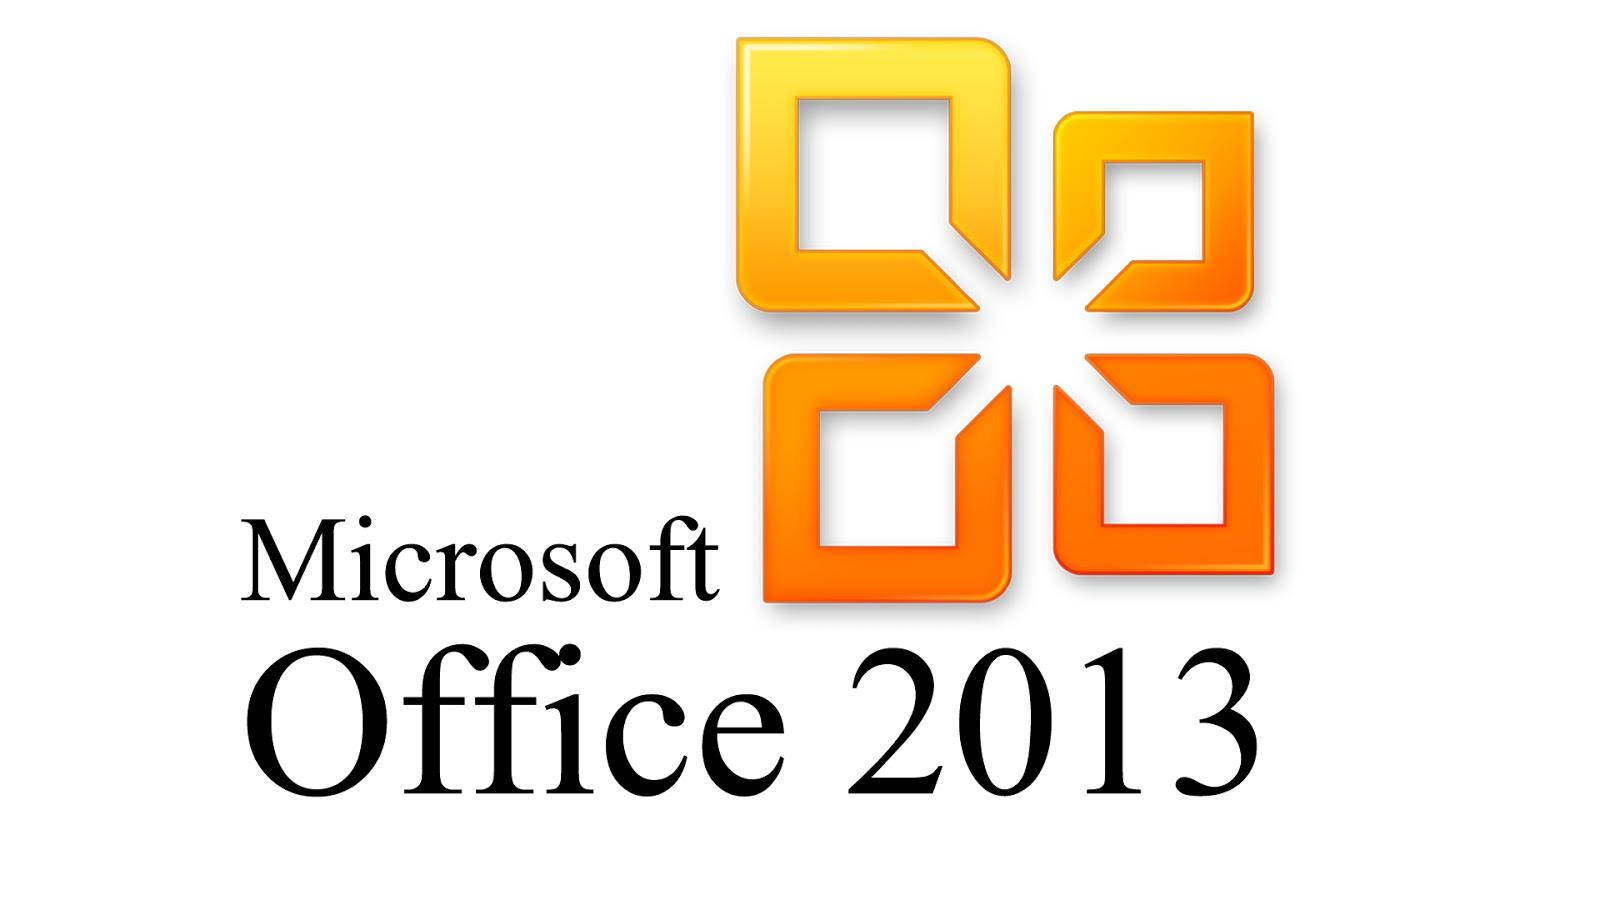 http://2.bp.blogspot.com/-R3psOaKcqnM/UIfqD5qvJQI/AAAAAAAAAJk/RRHF48QVZaw/s1600/Wallpaper-Android-And-iOS-Will-Get-Office-2013.jpg